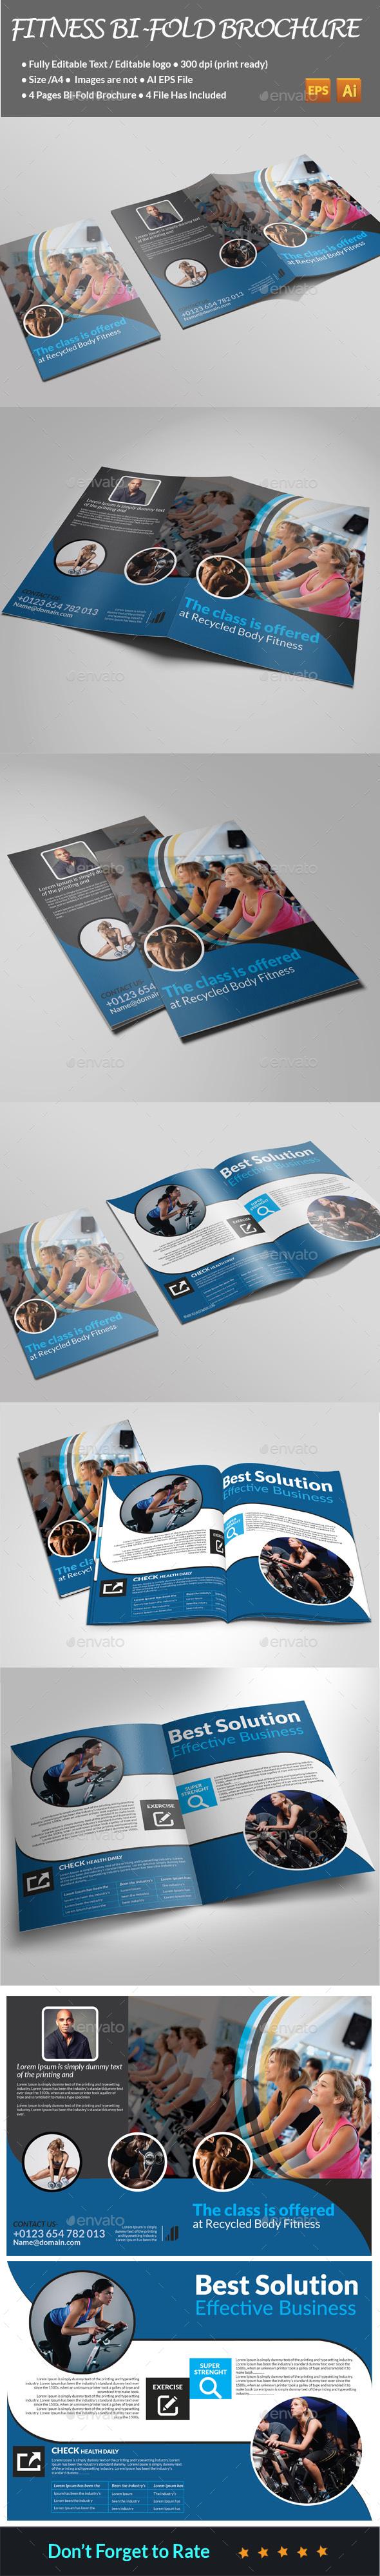 Fitness Bi-Fold Brochure  - Brochures Print Templates